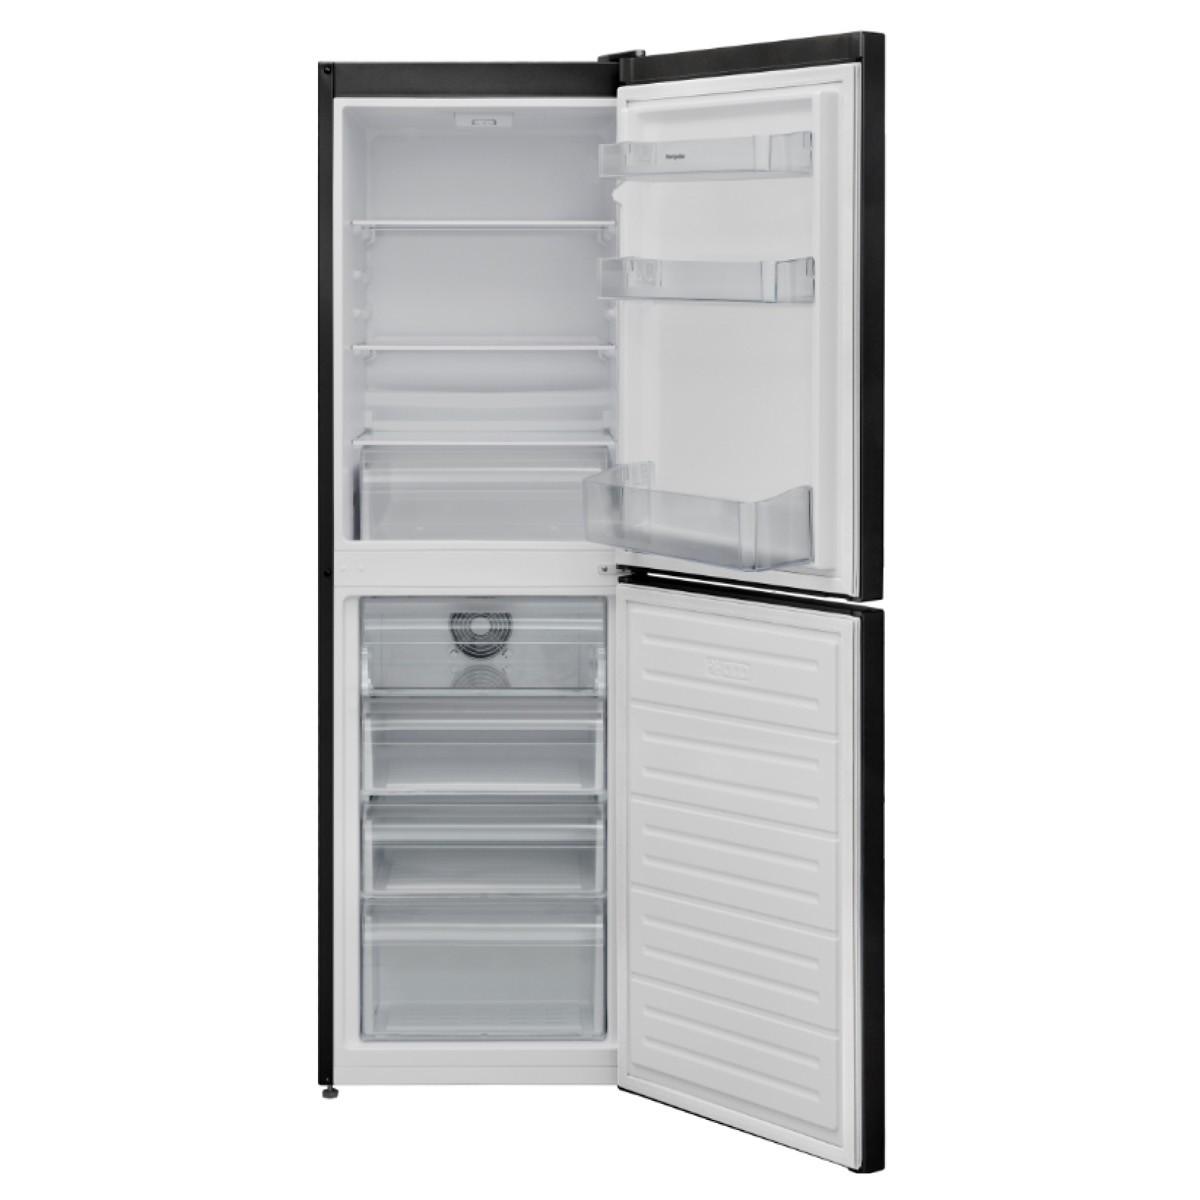 Montpellier MFF165K Fridge Freezer